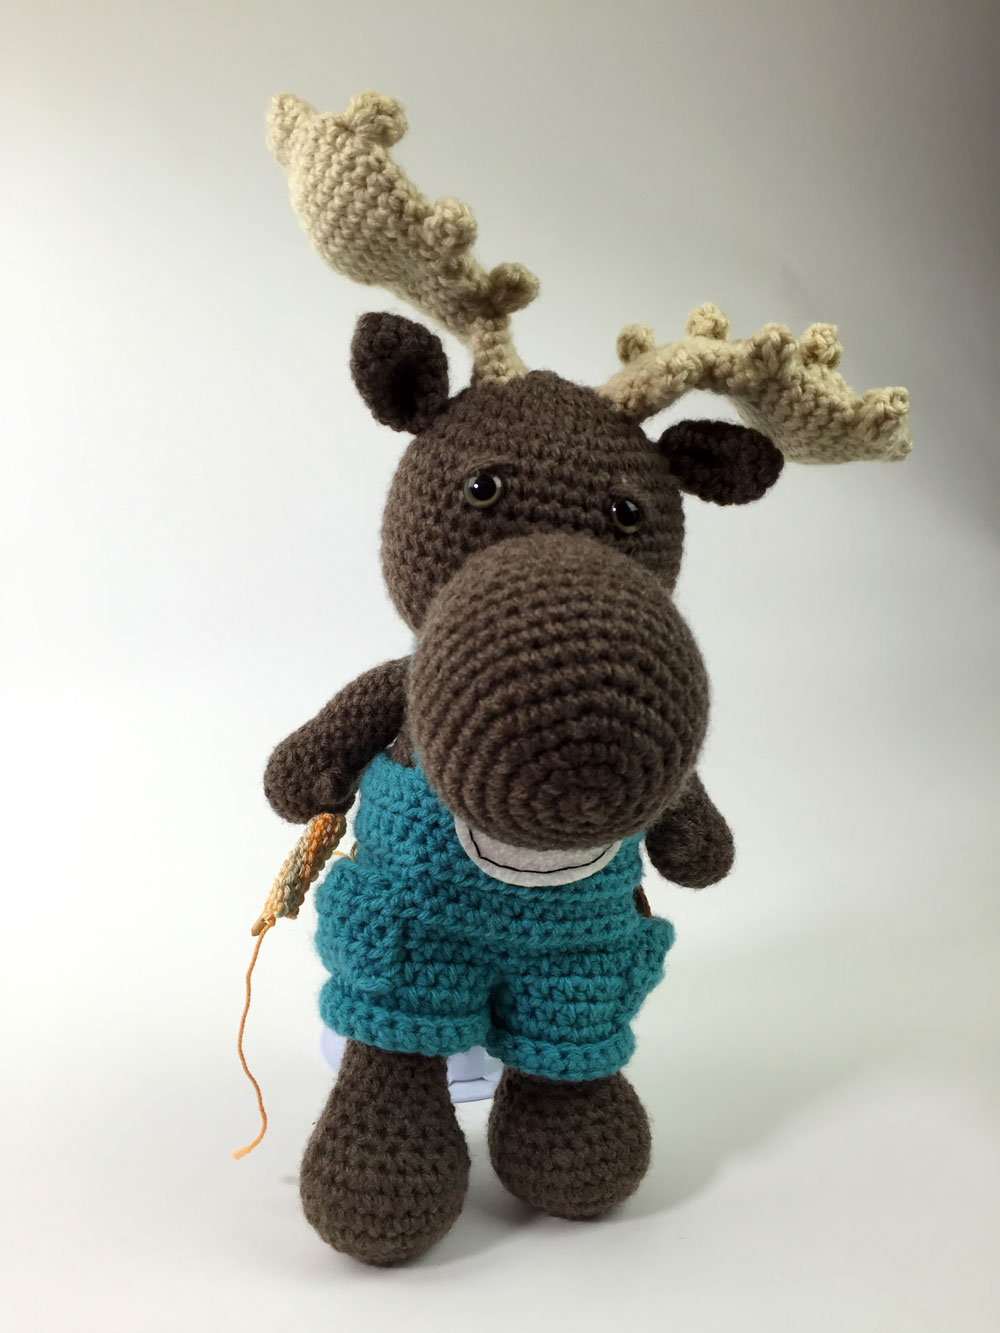 Crochet Moose Amigurumi by Nikki Baker